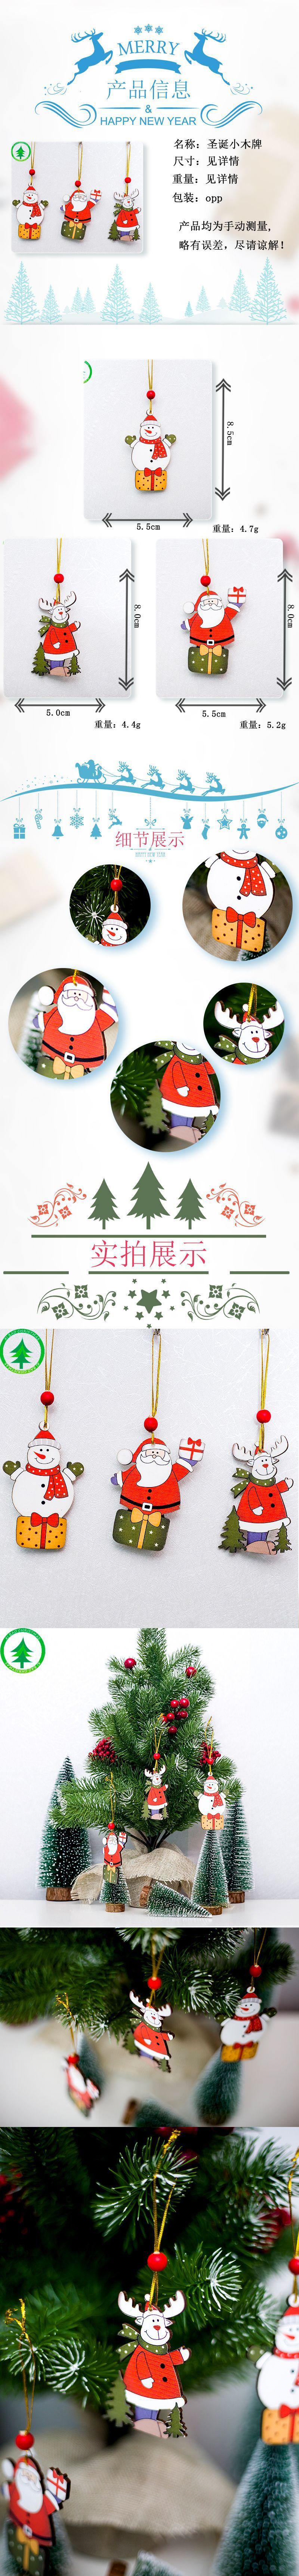 3PCS DIY Christmas Santa Claus Wooden Pendants Ornaments Kid Gift